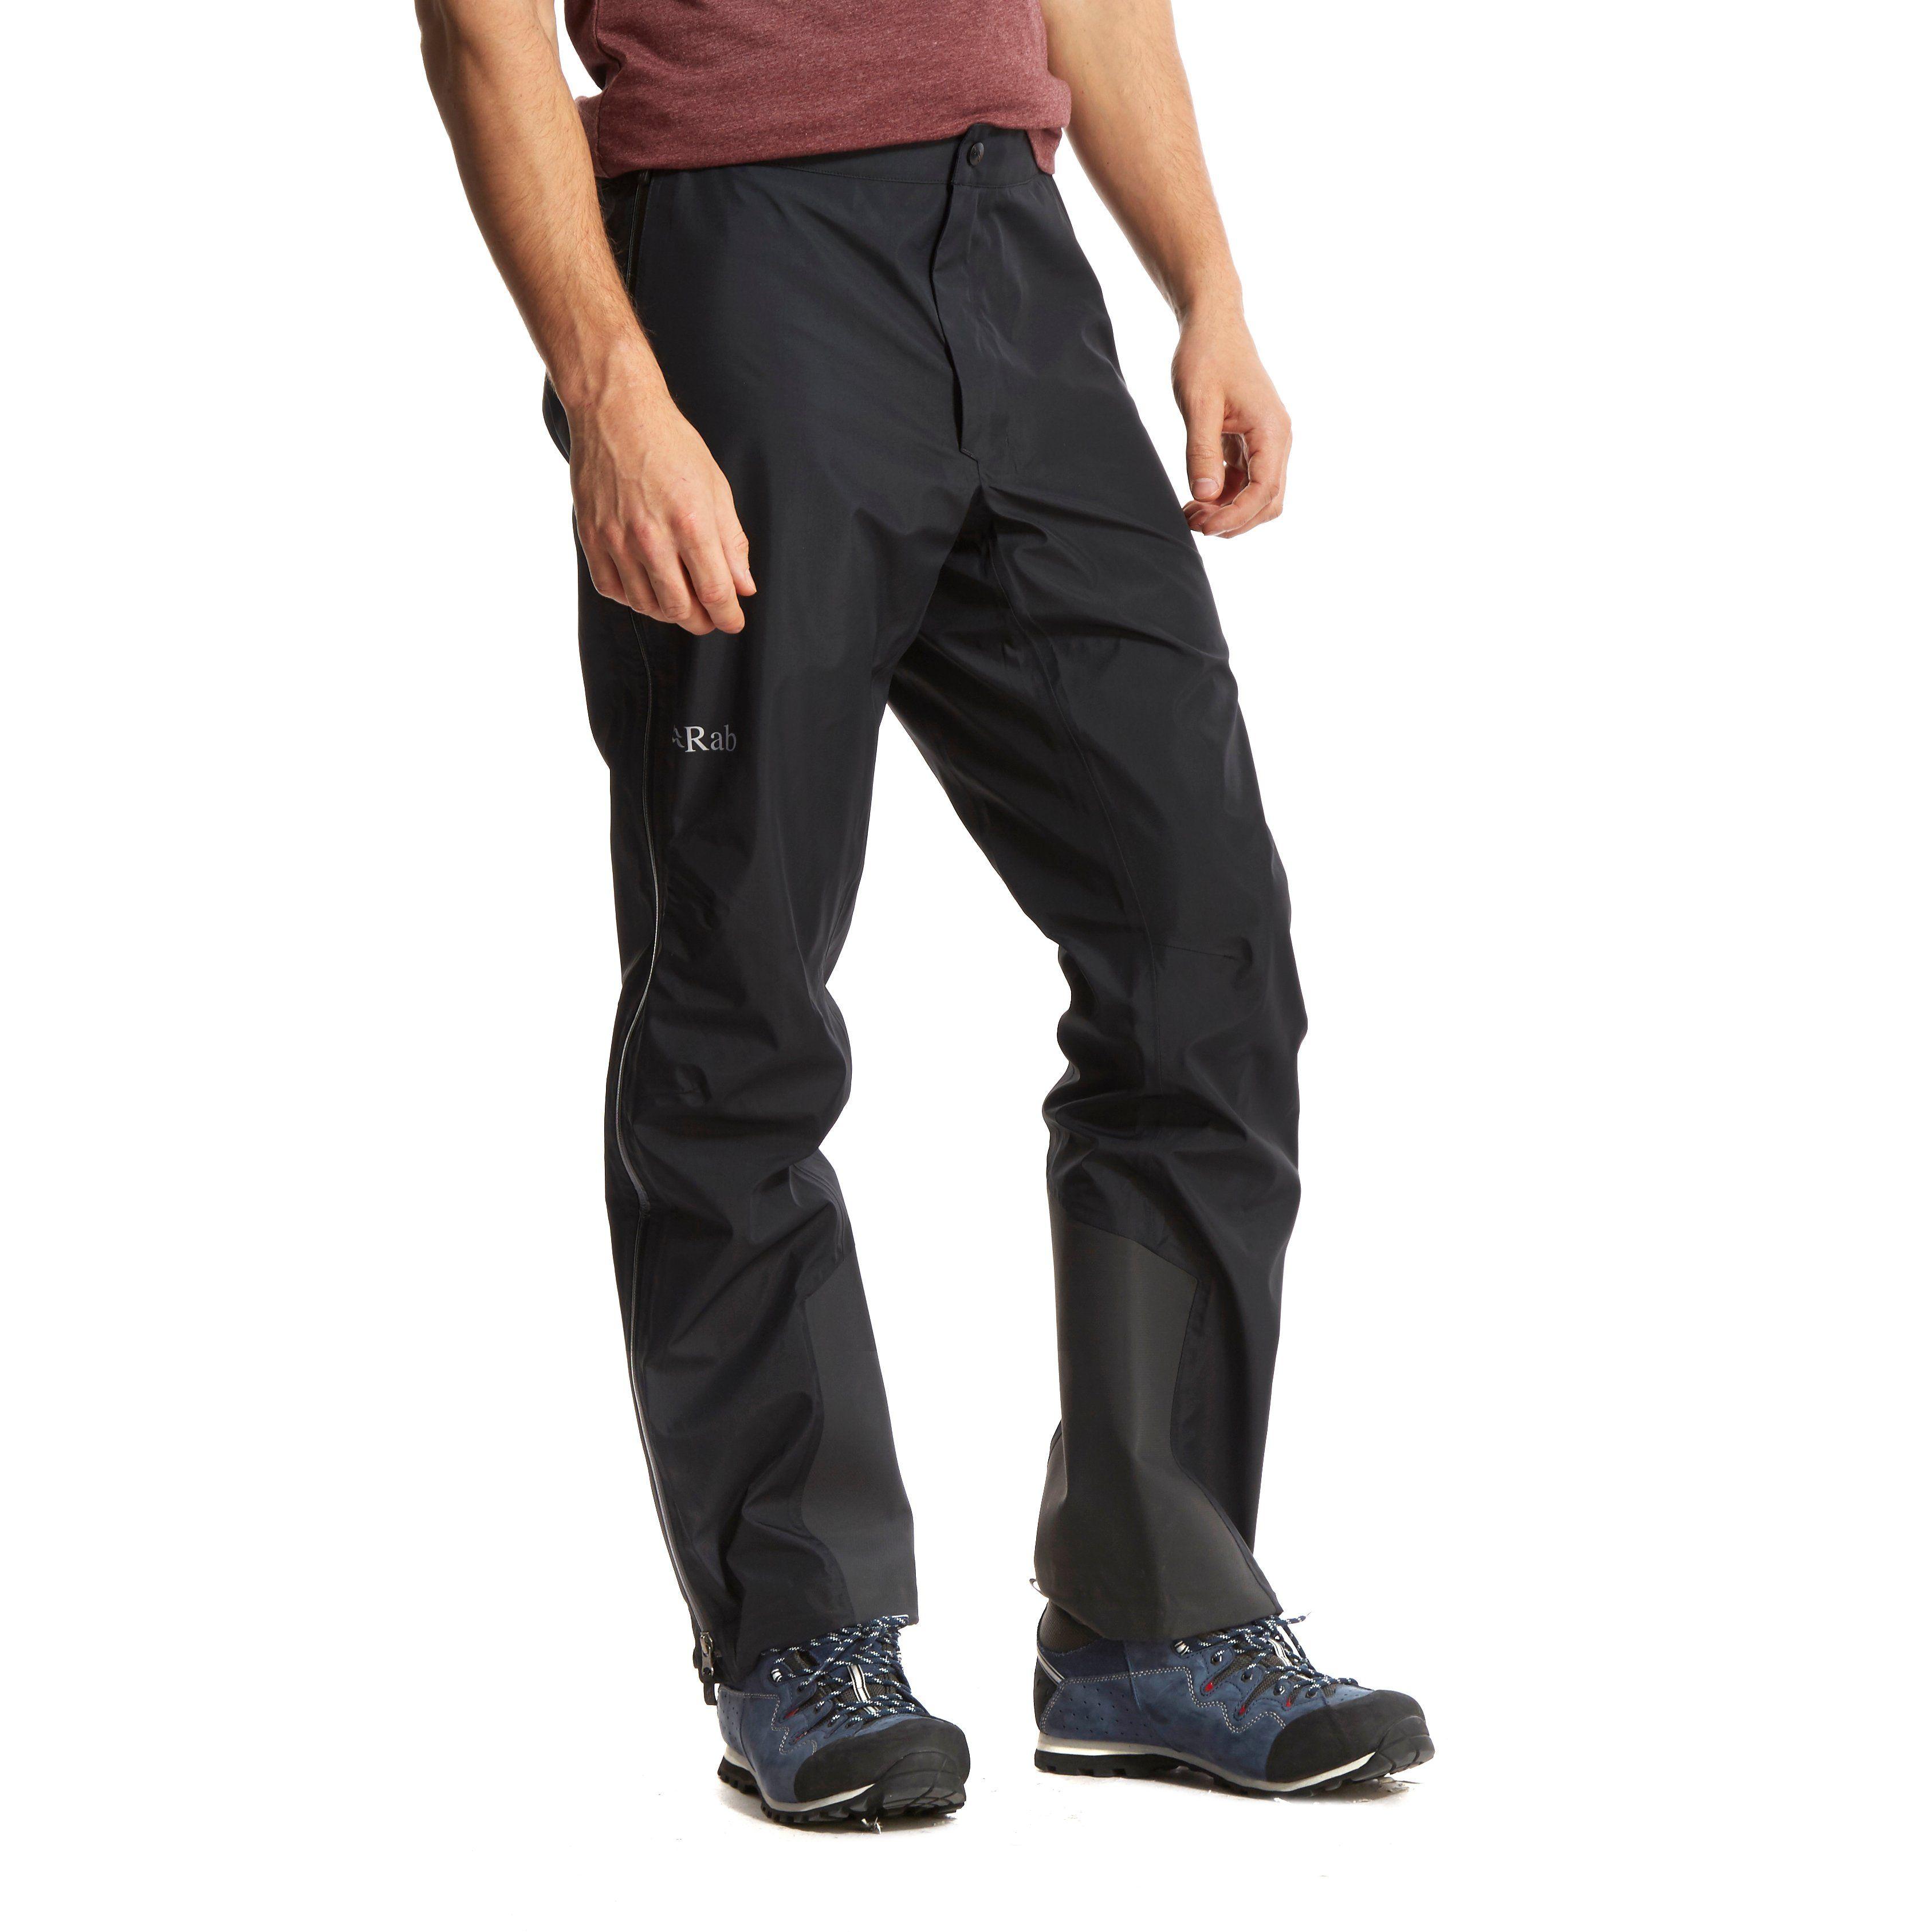 RAB Men's Latok eVent® Waterproof Over Trousers